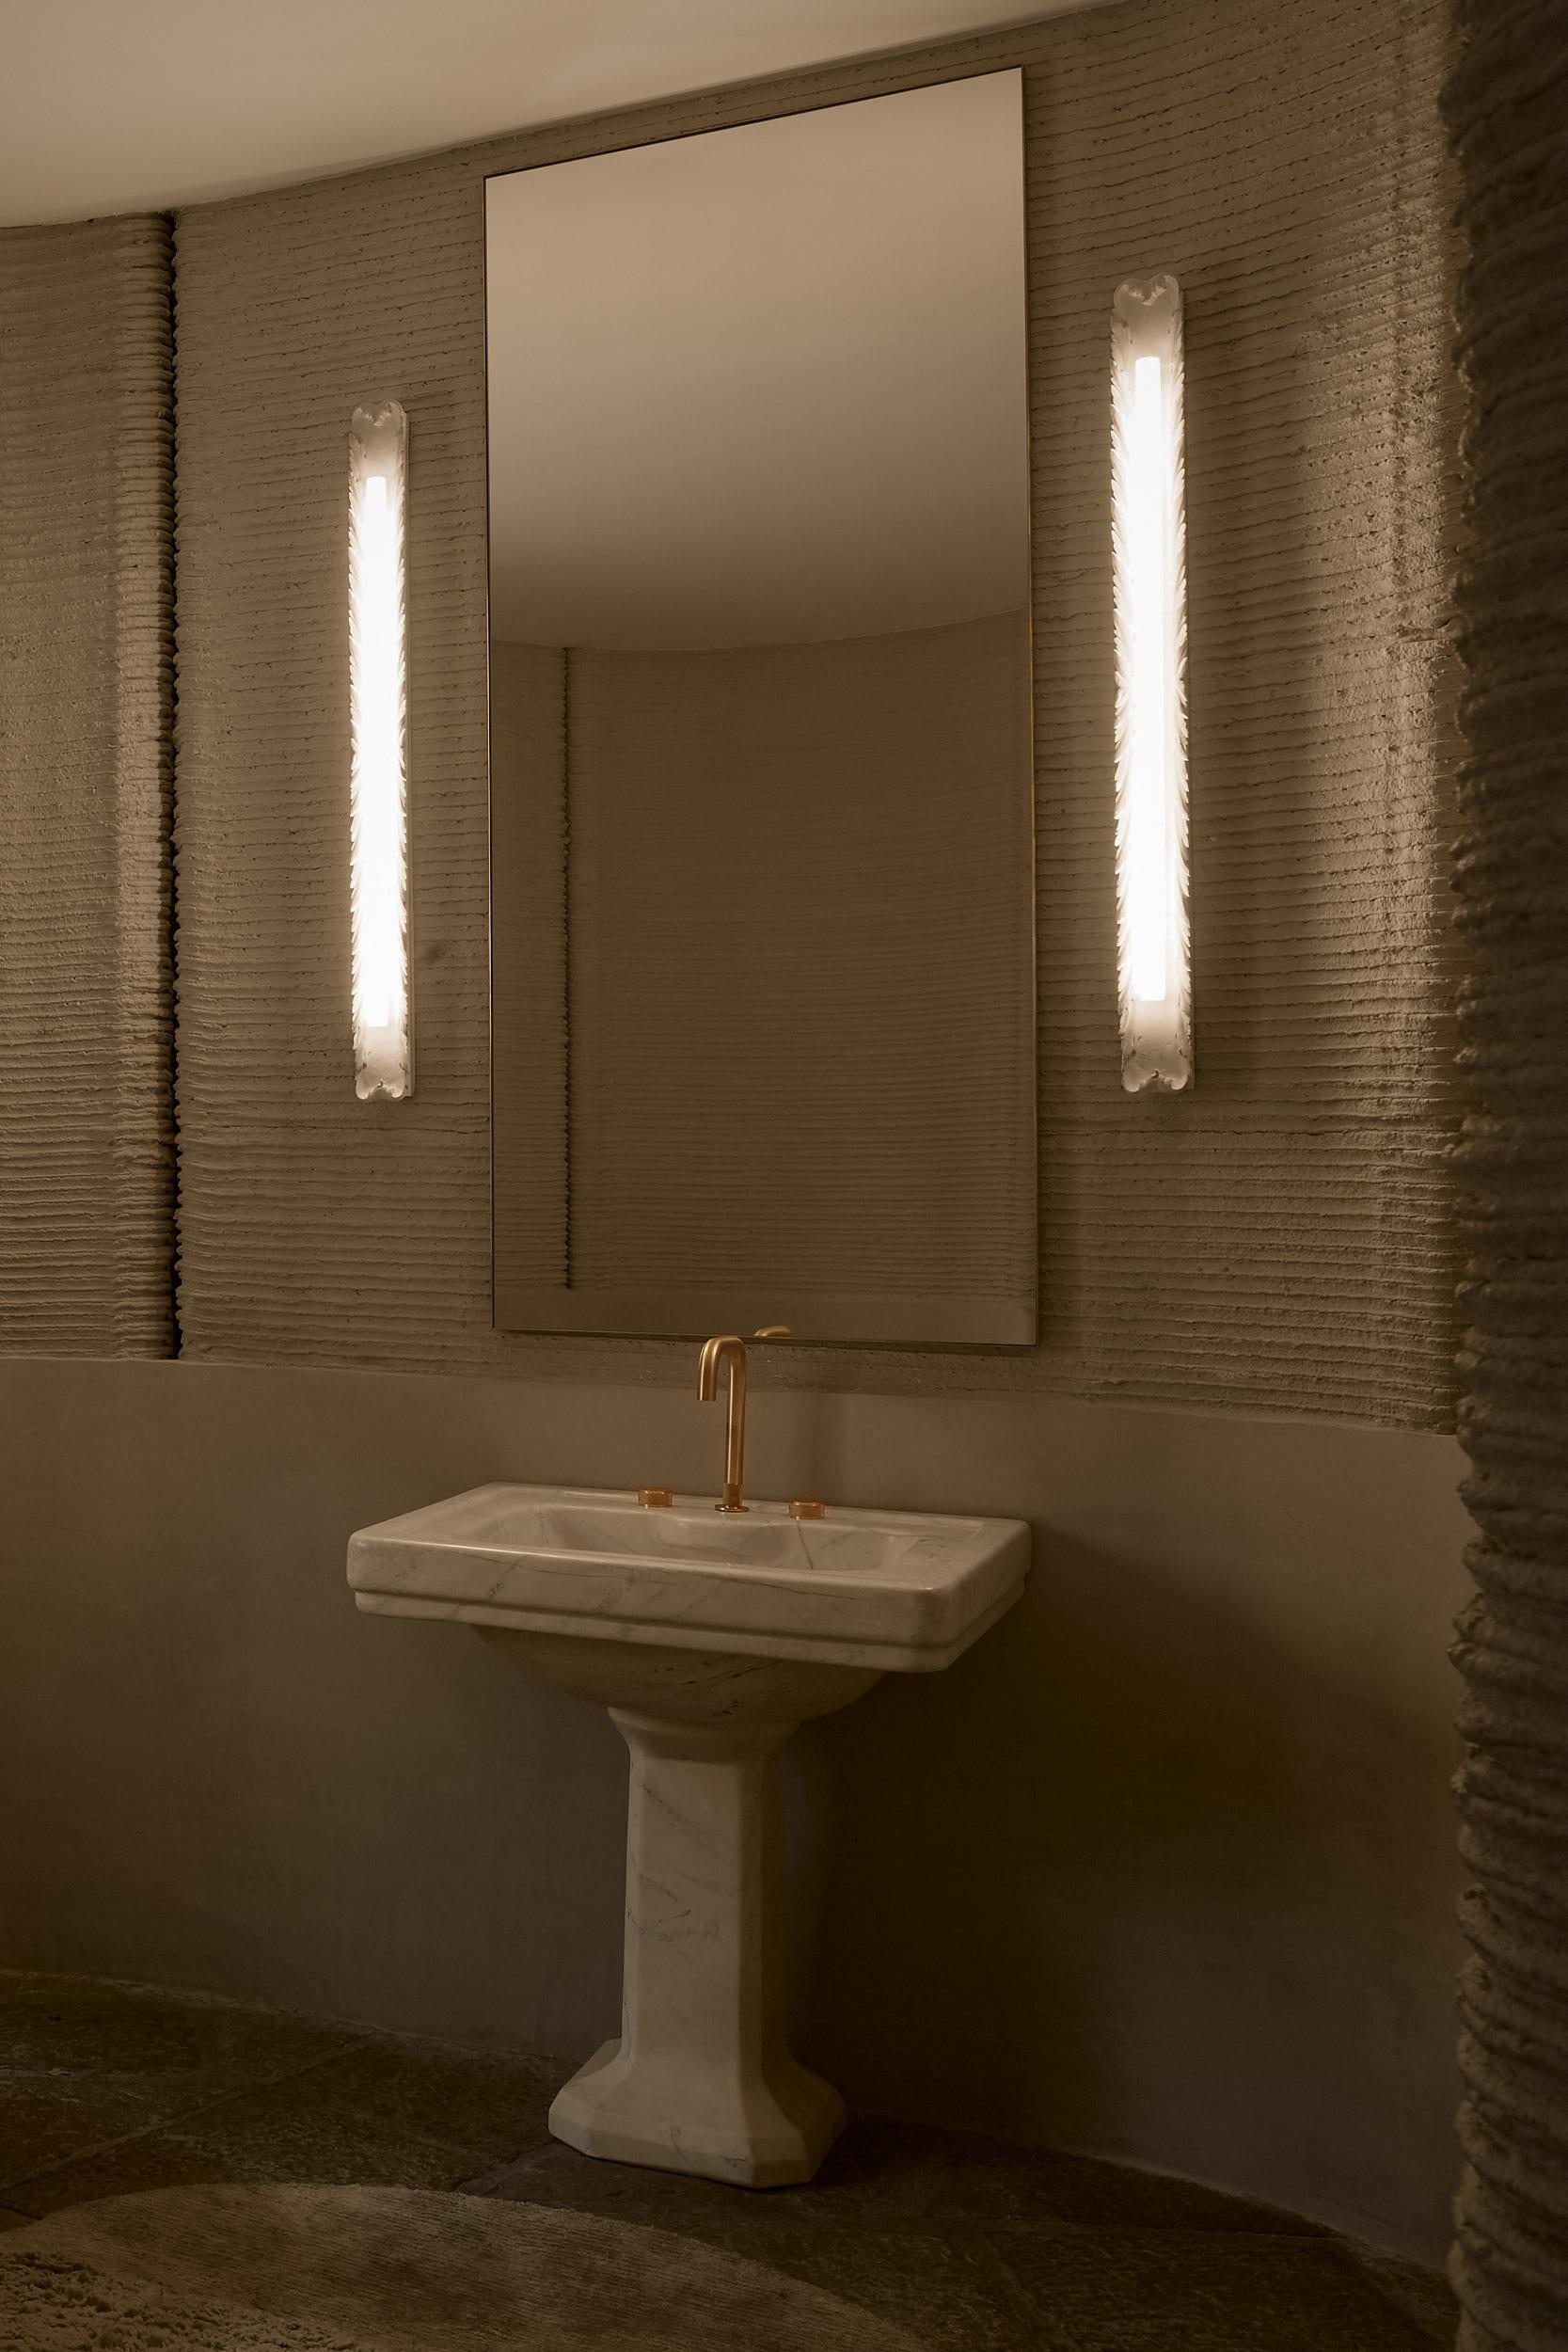 3D Housing 05 by CLS Architetti on Anniversary Magazine. Photo by Alex Lesage — threefold 2.jpg